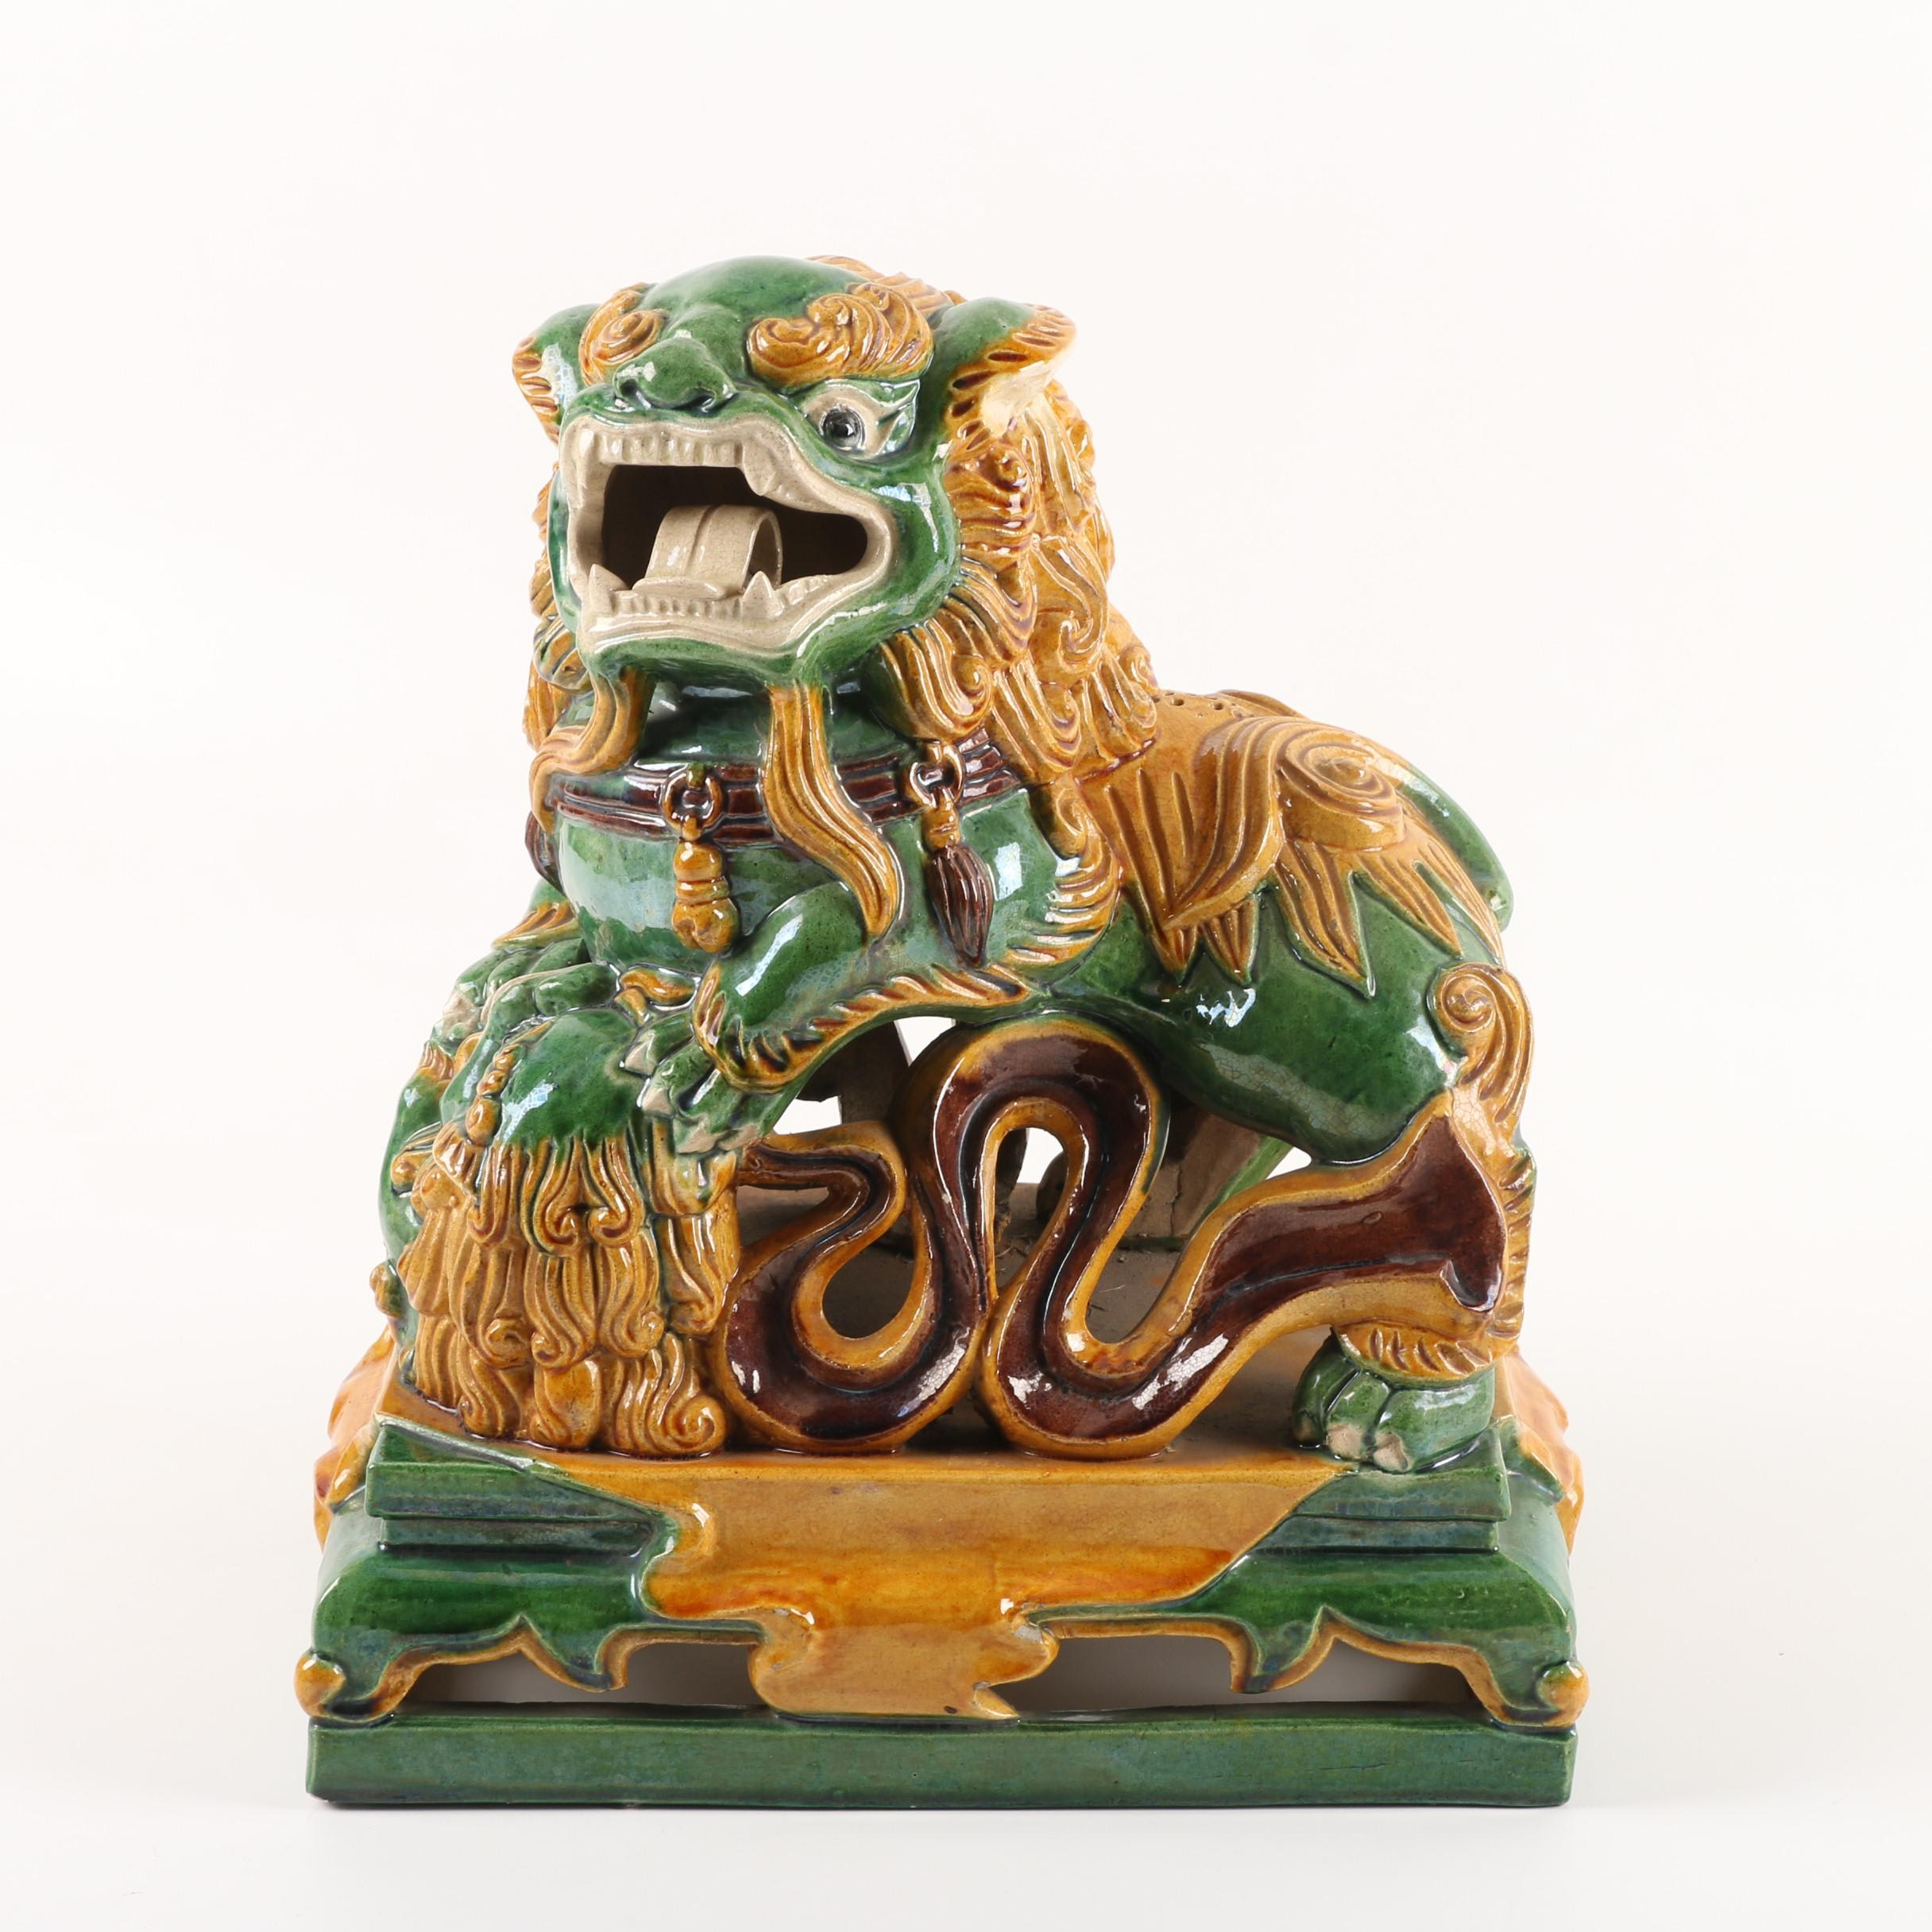 Chinese Sancai Glazed Guardian Lion Ceramic Figurine